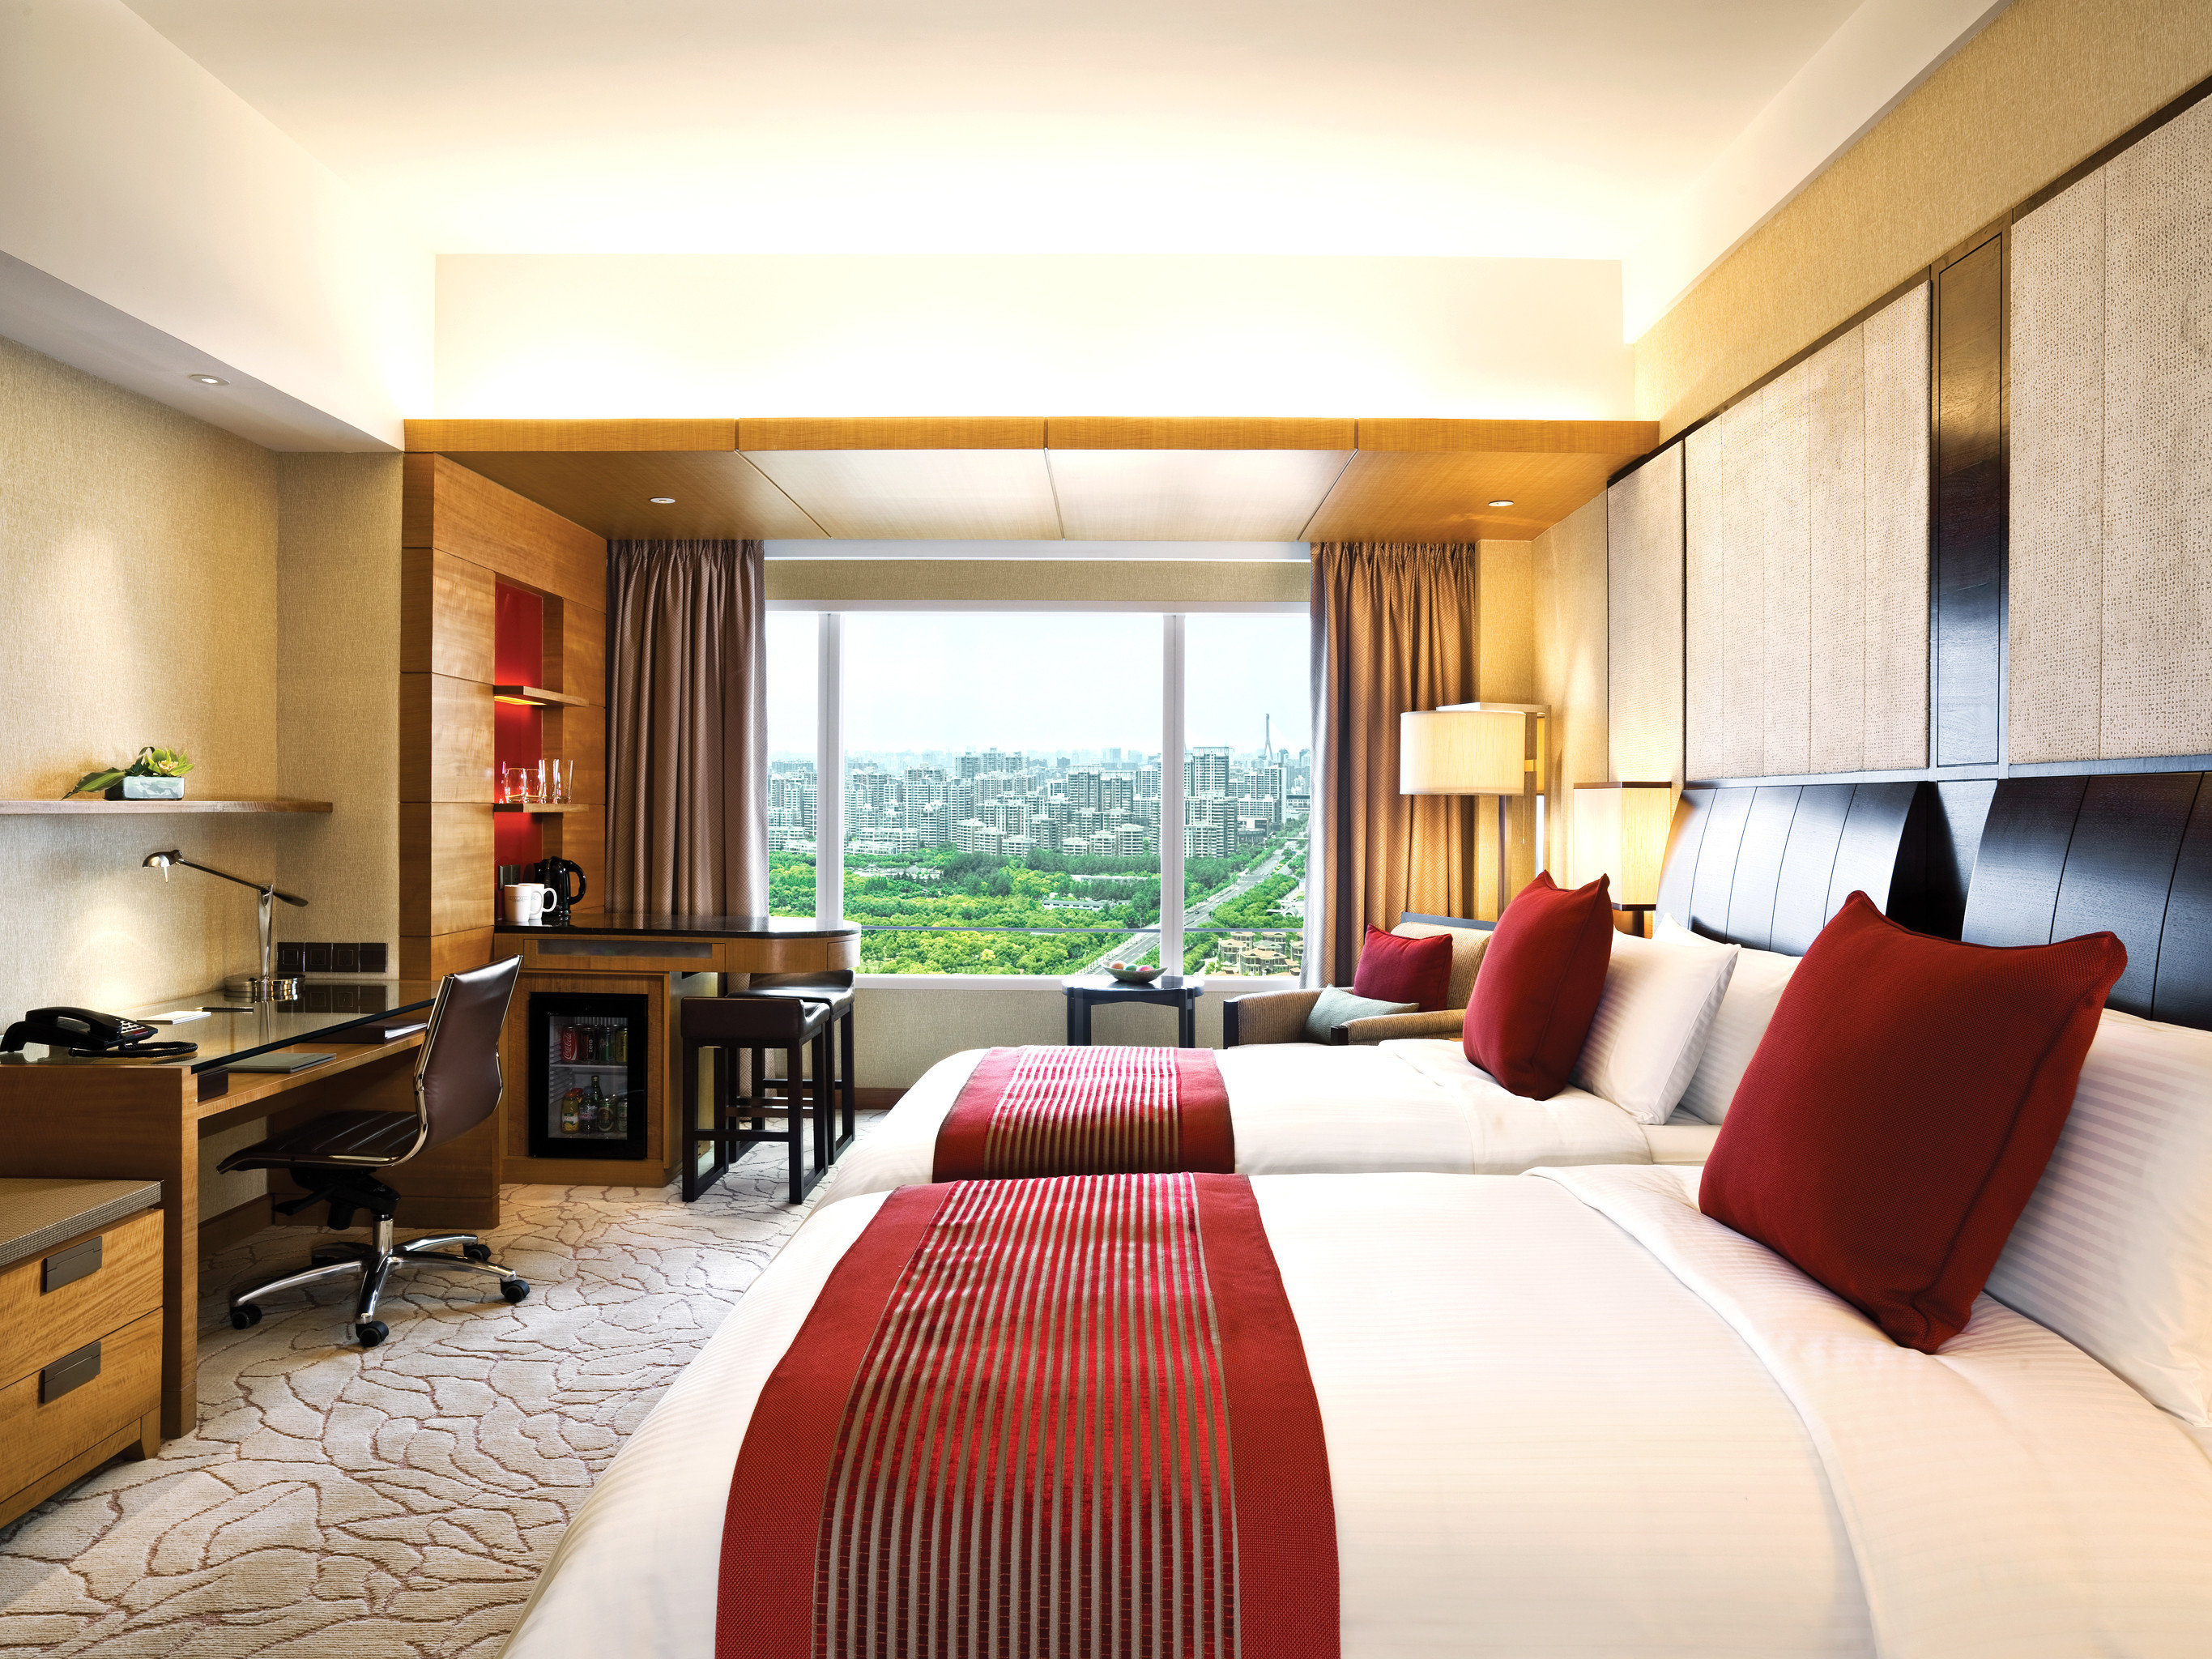 Bedroom Modern Scenic views Suite sofa property condominium Resort cottage living room Villa flat